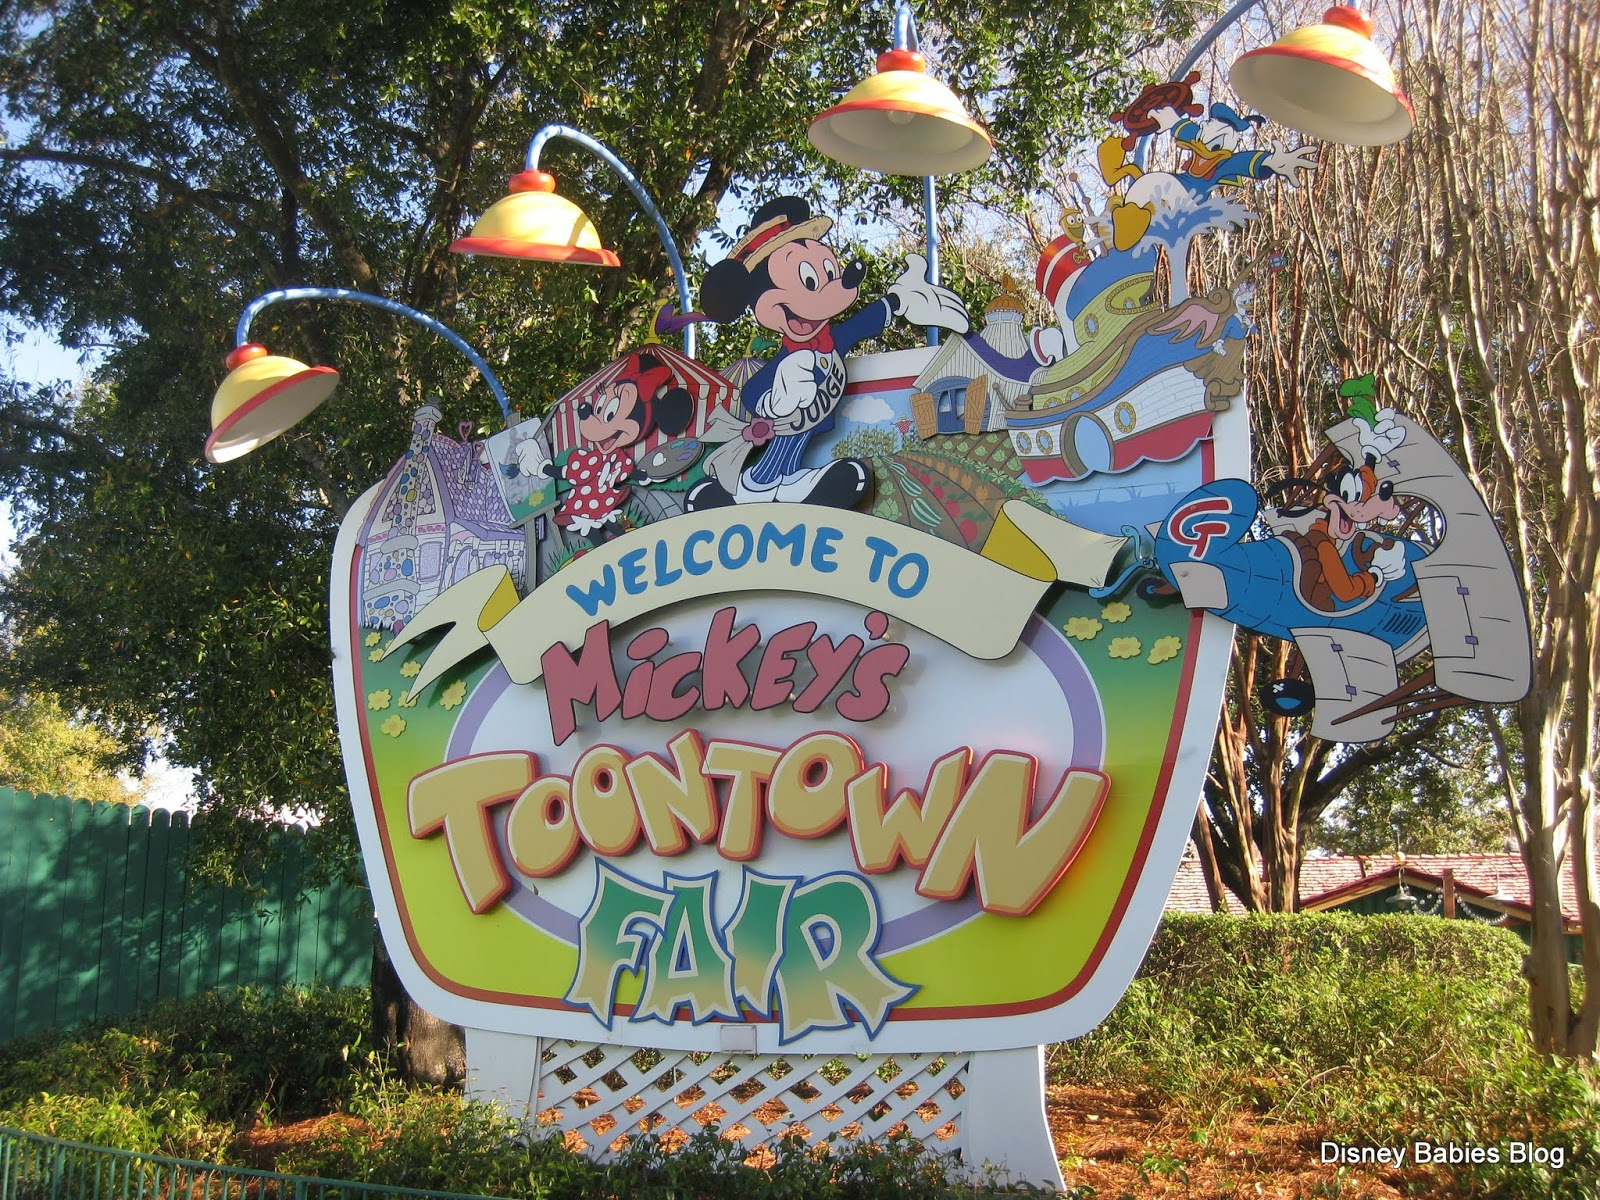 Mickey's Toon Town Fair,